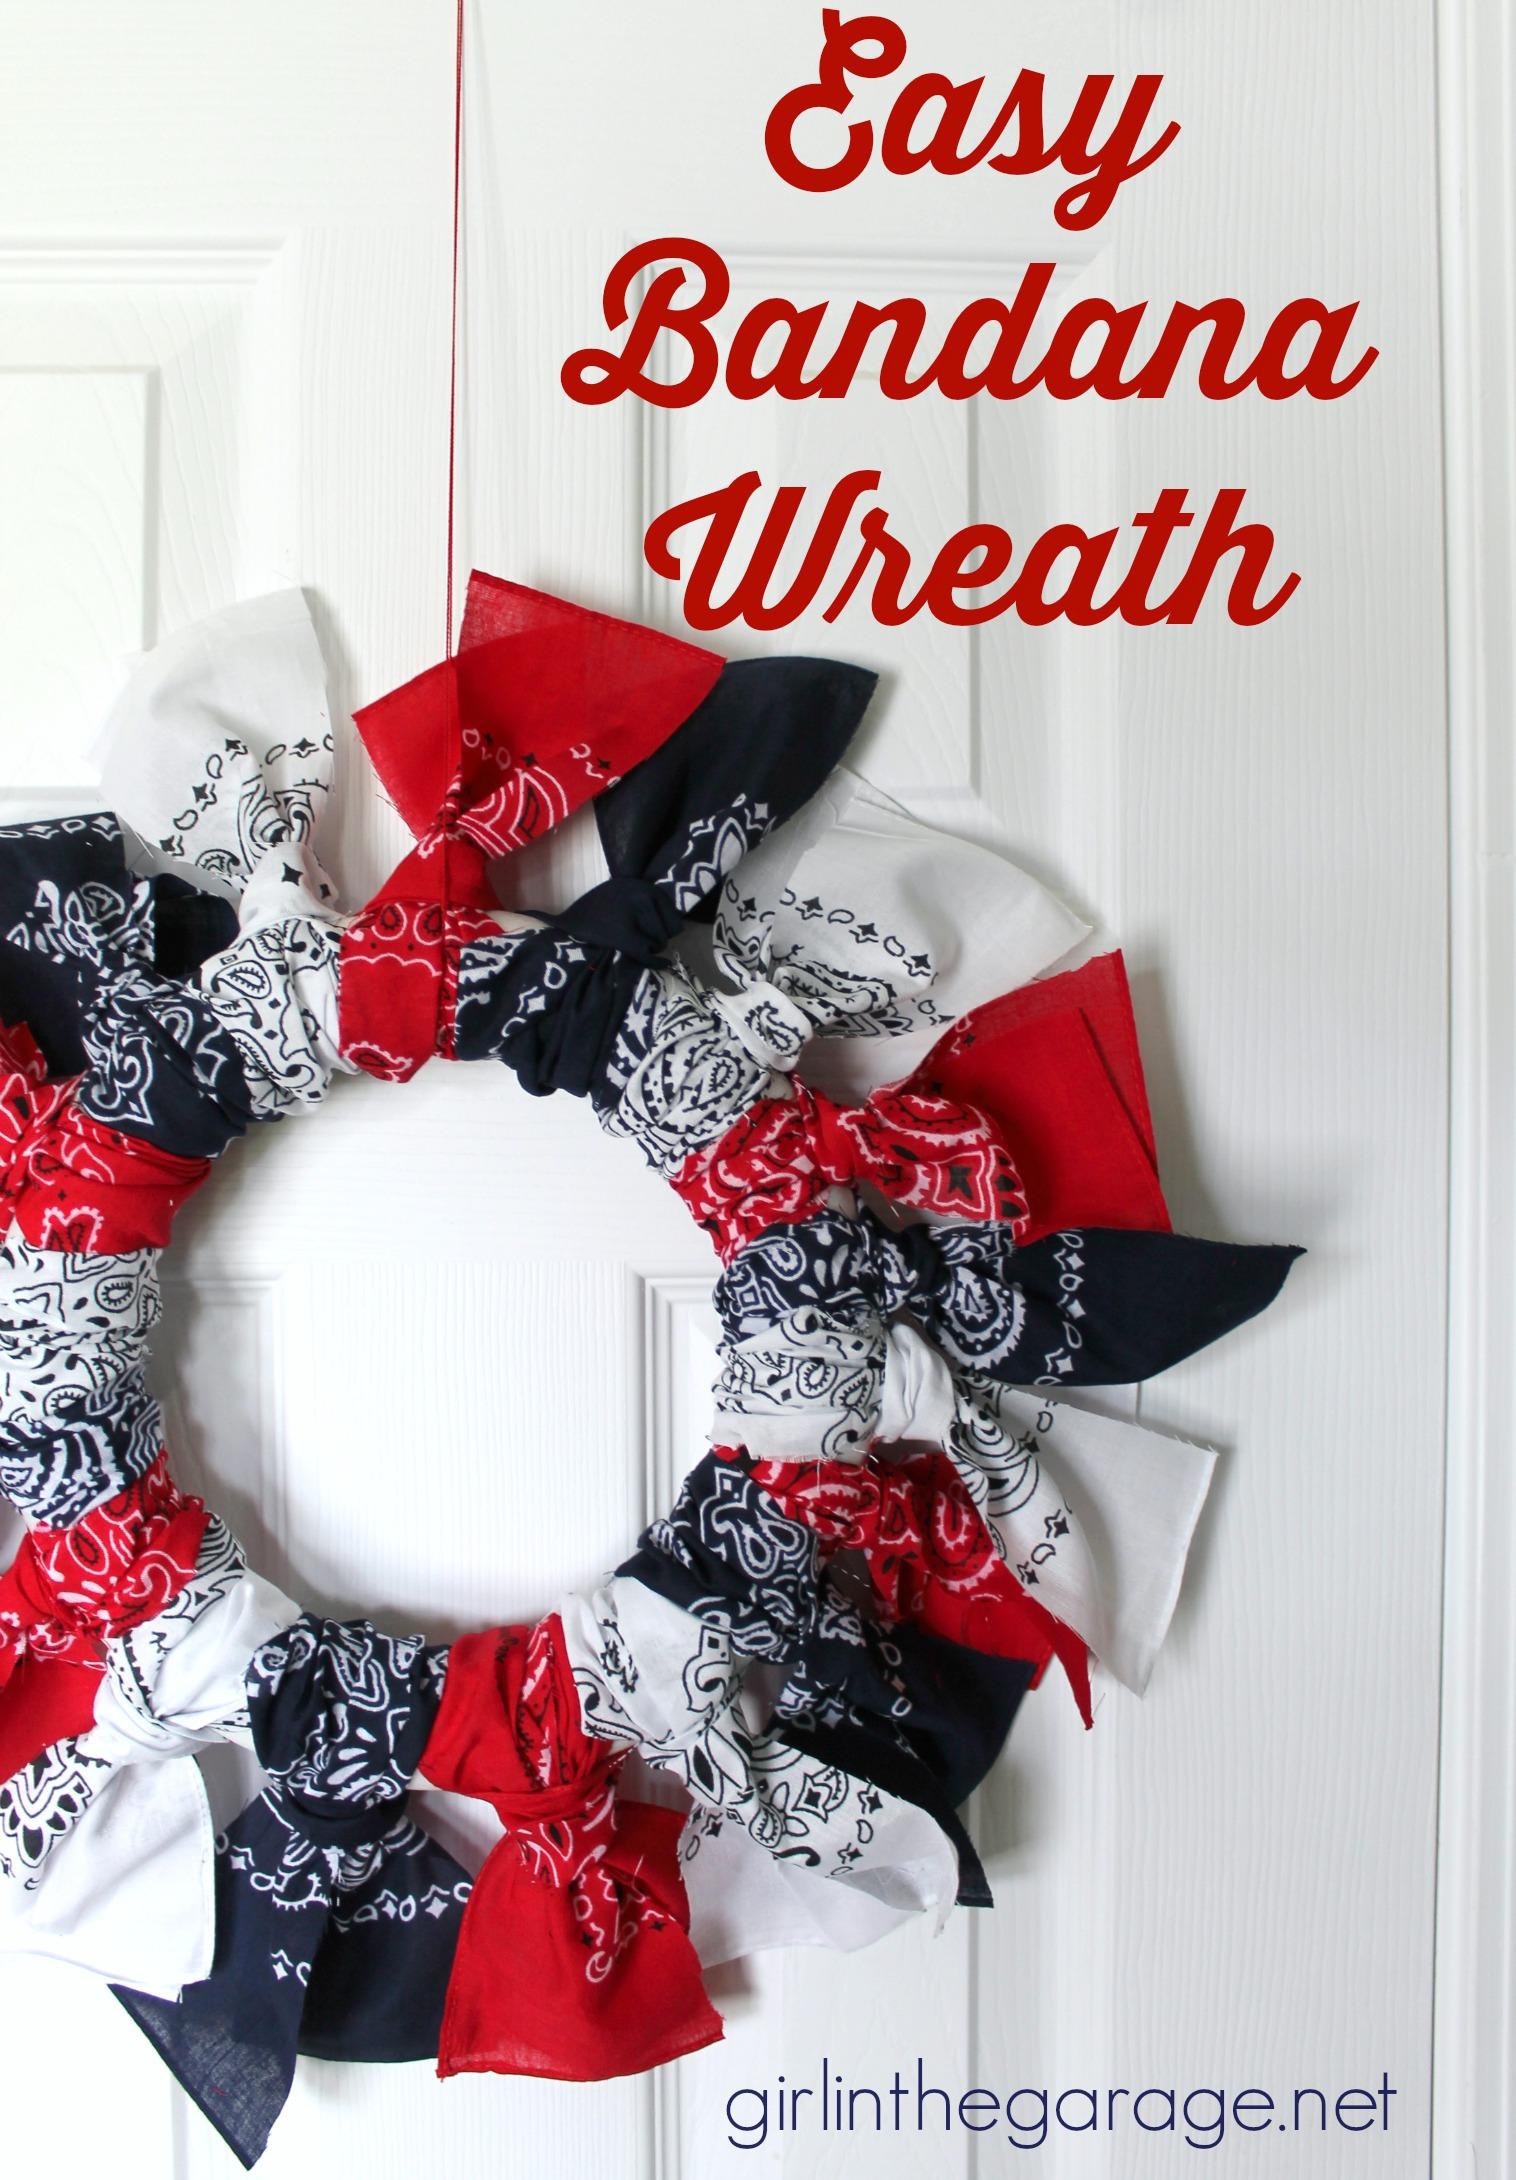 Easy DIY Bandana Wreath! From Girl in the Garage